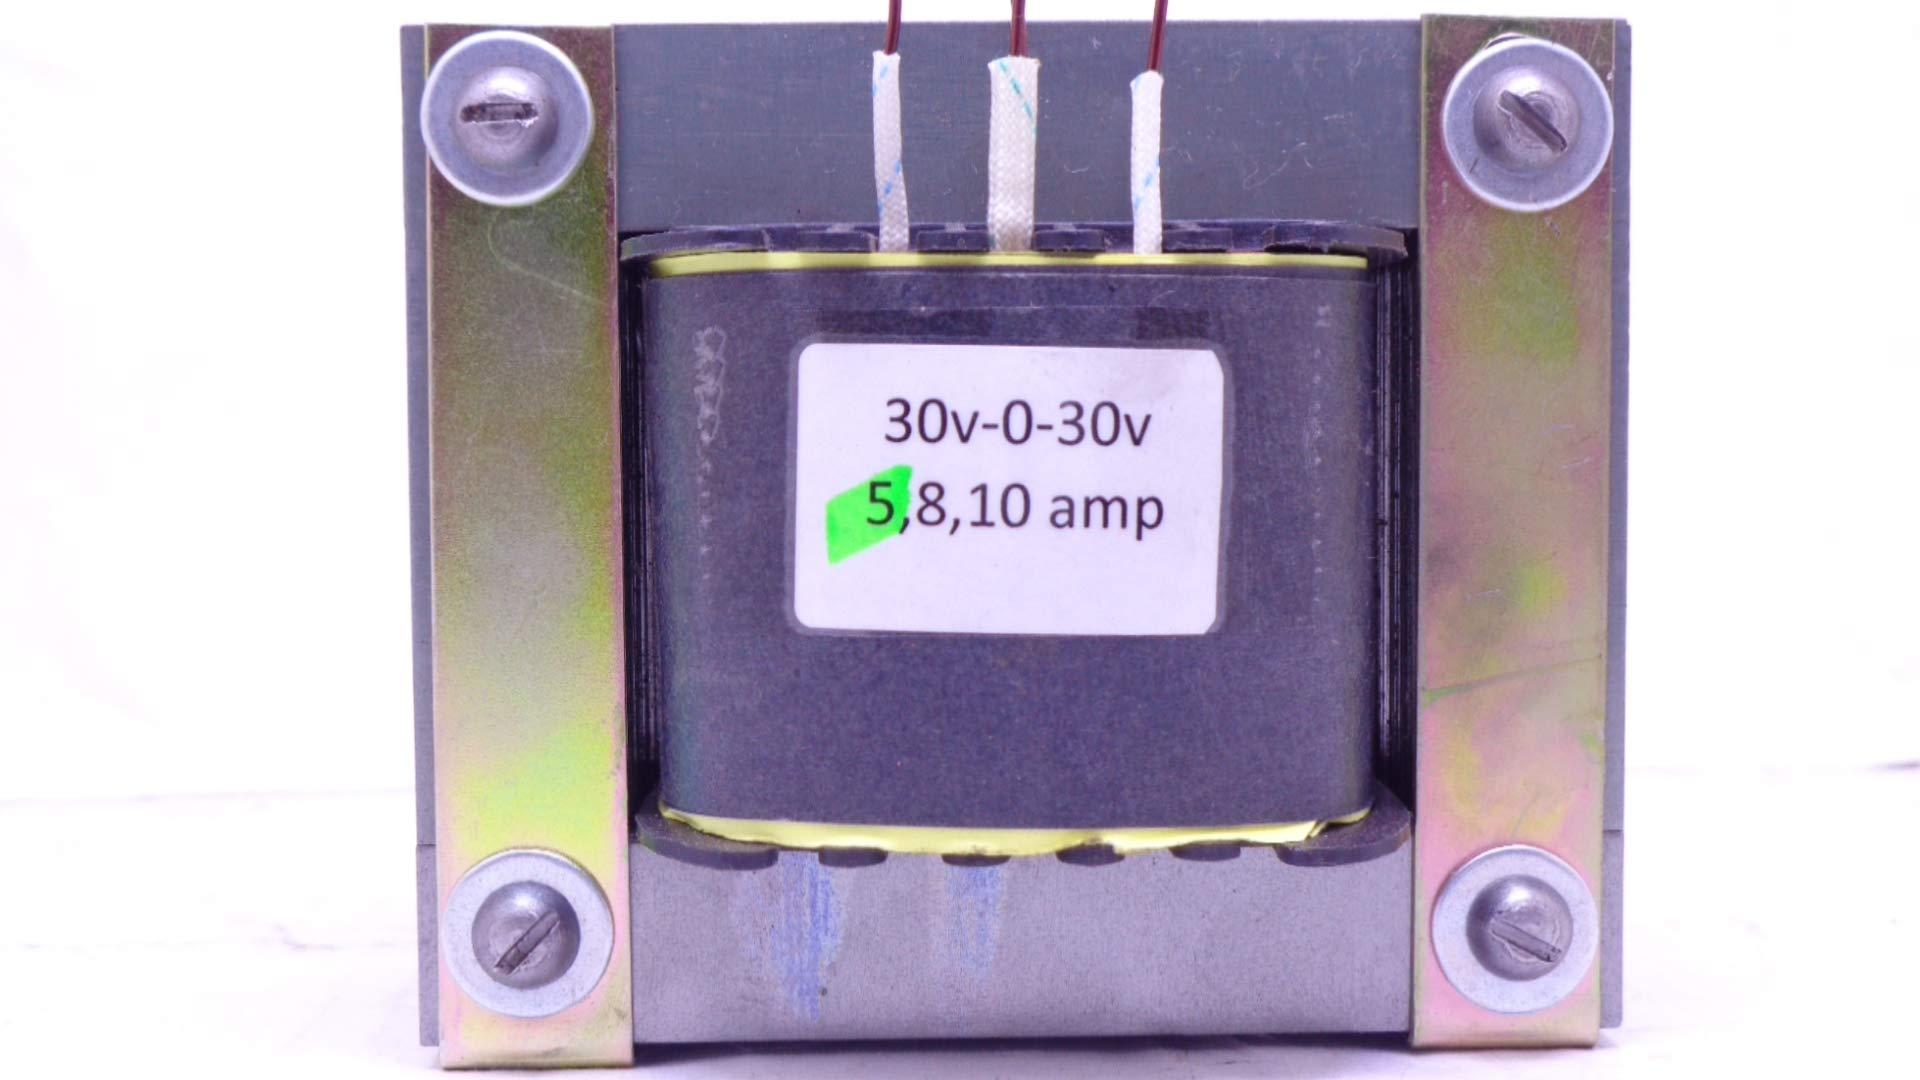 30v-0-30v 5amp with 0-12v 1amp 100% Copper stepdown Transformer (B07WR1KDFW) Amazon Price History, Amazon Price Tracker